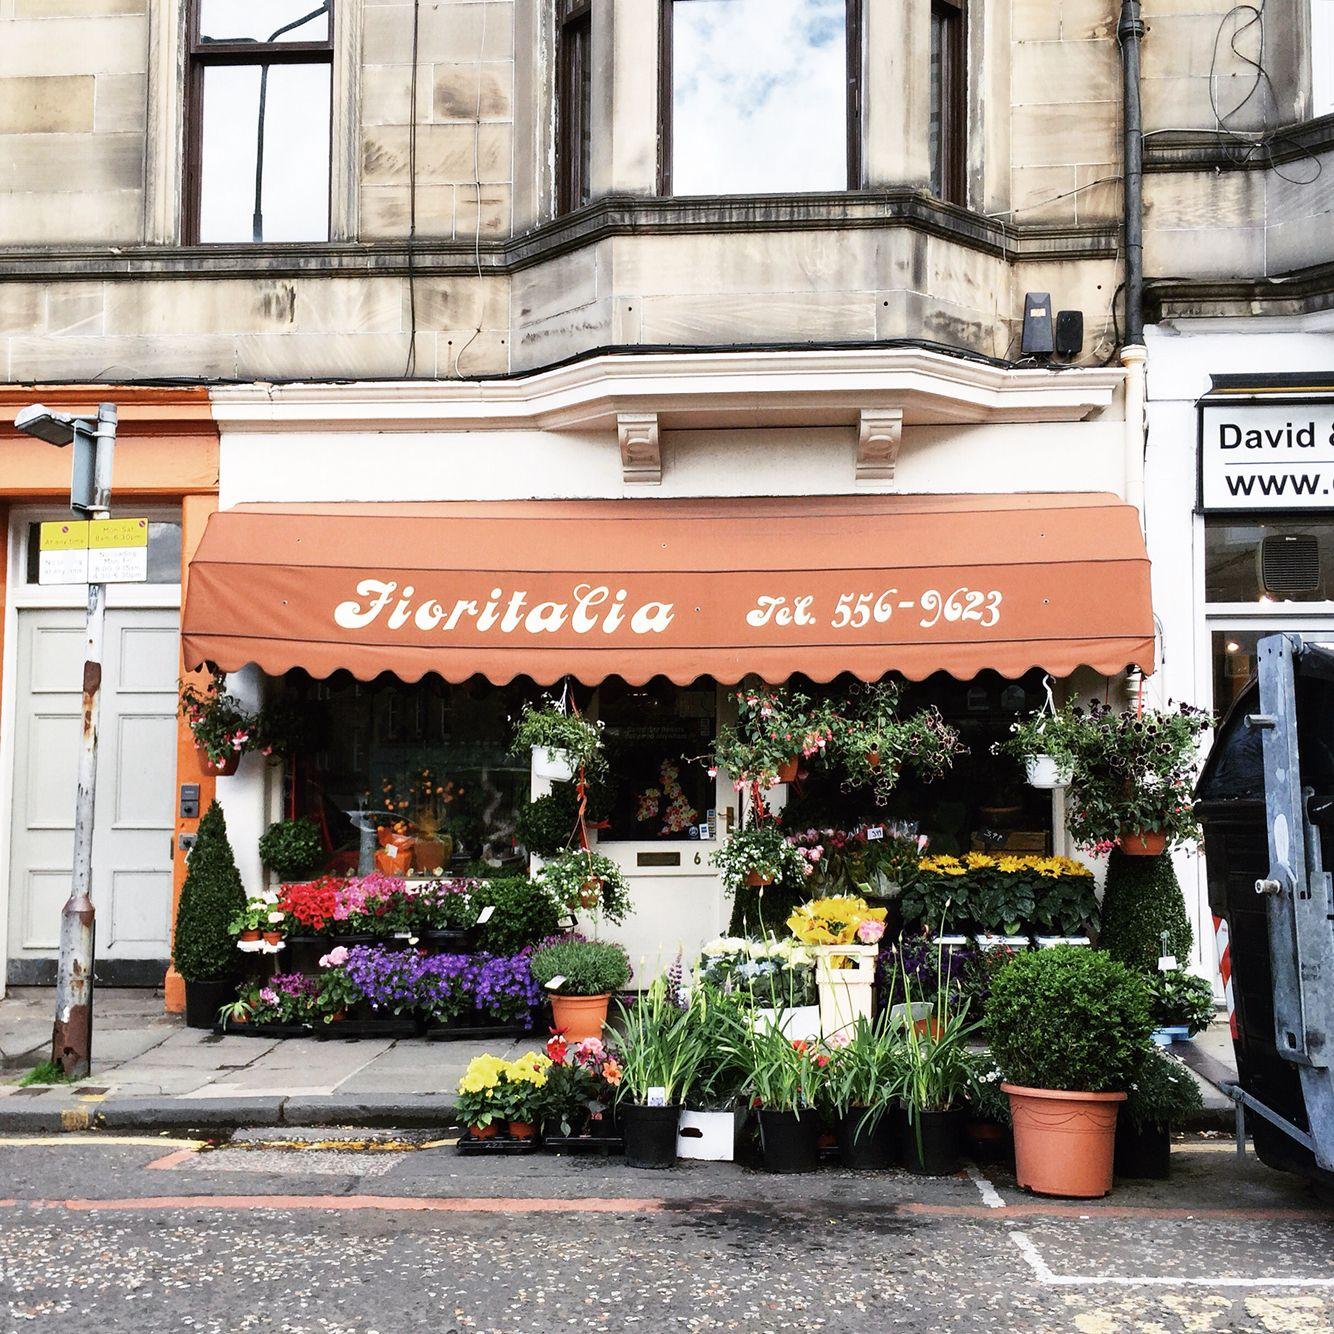 Fioritalia, flower shop in Edinburgh, Scotland (With